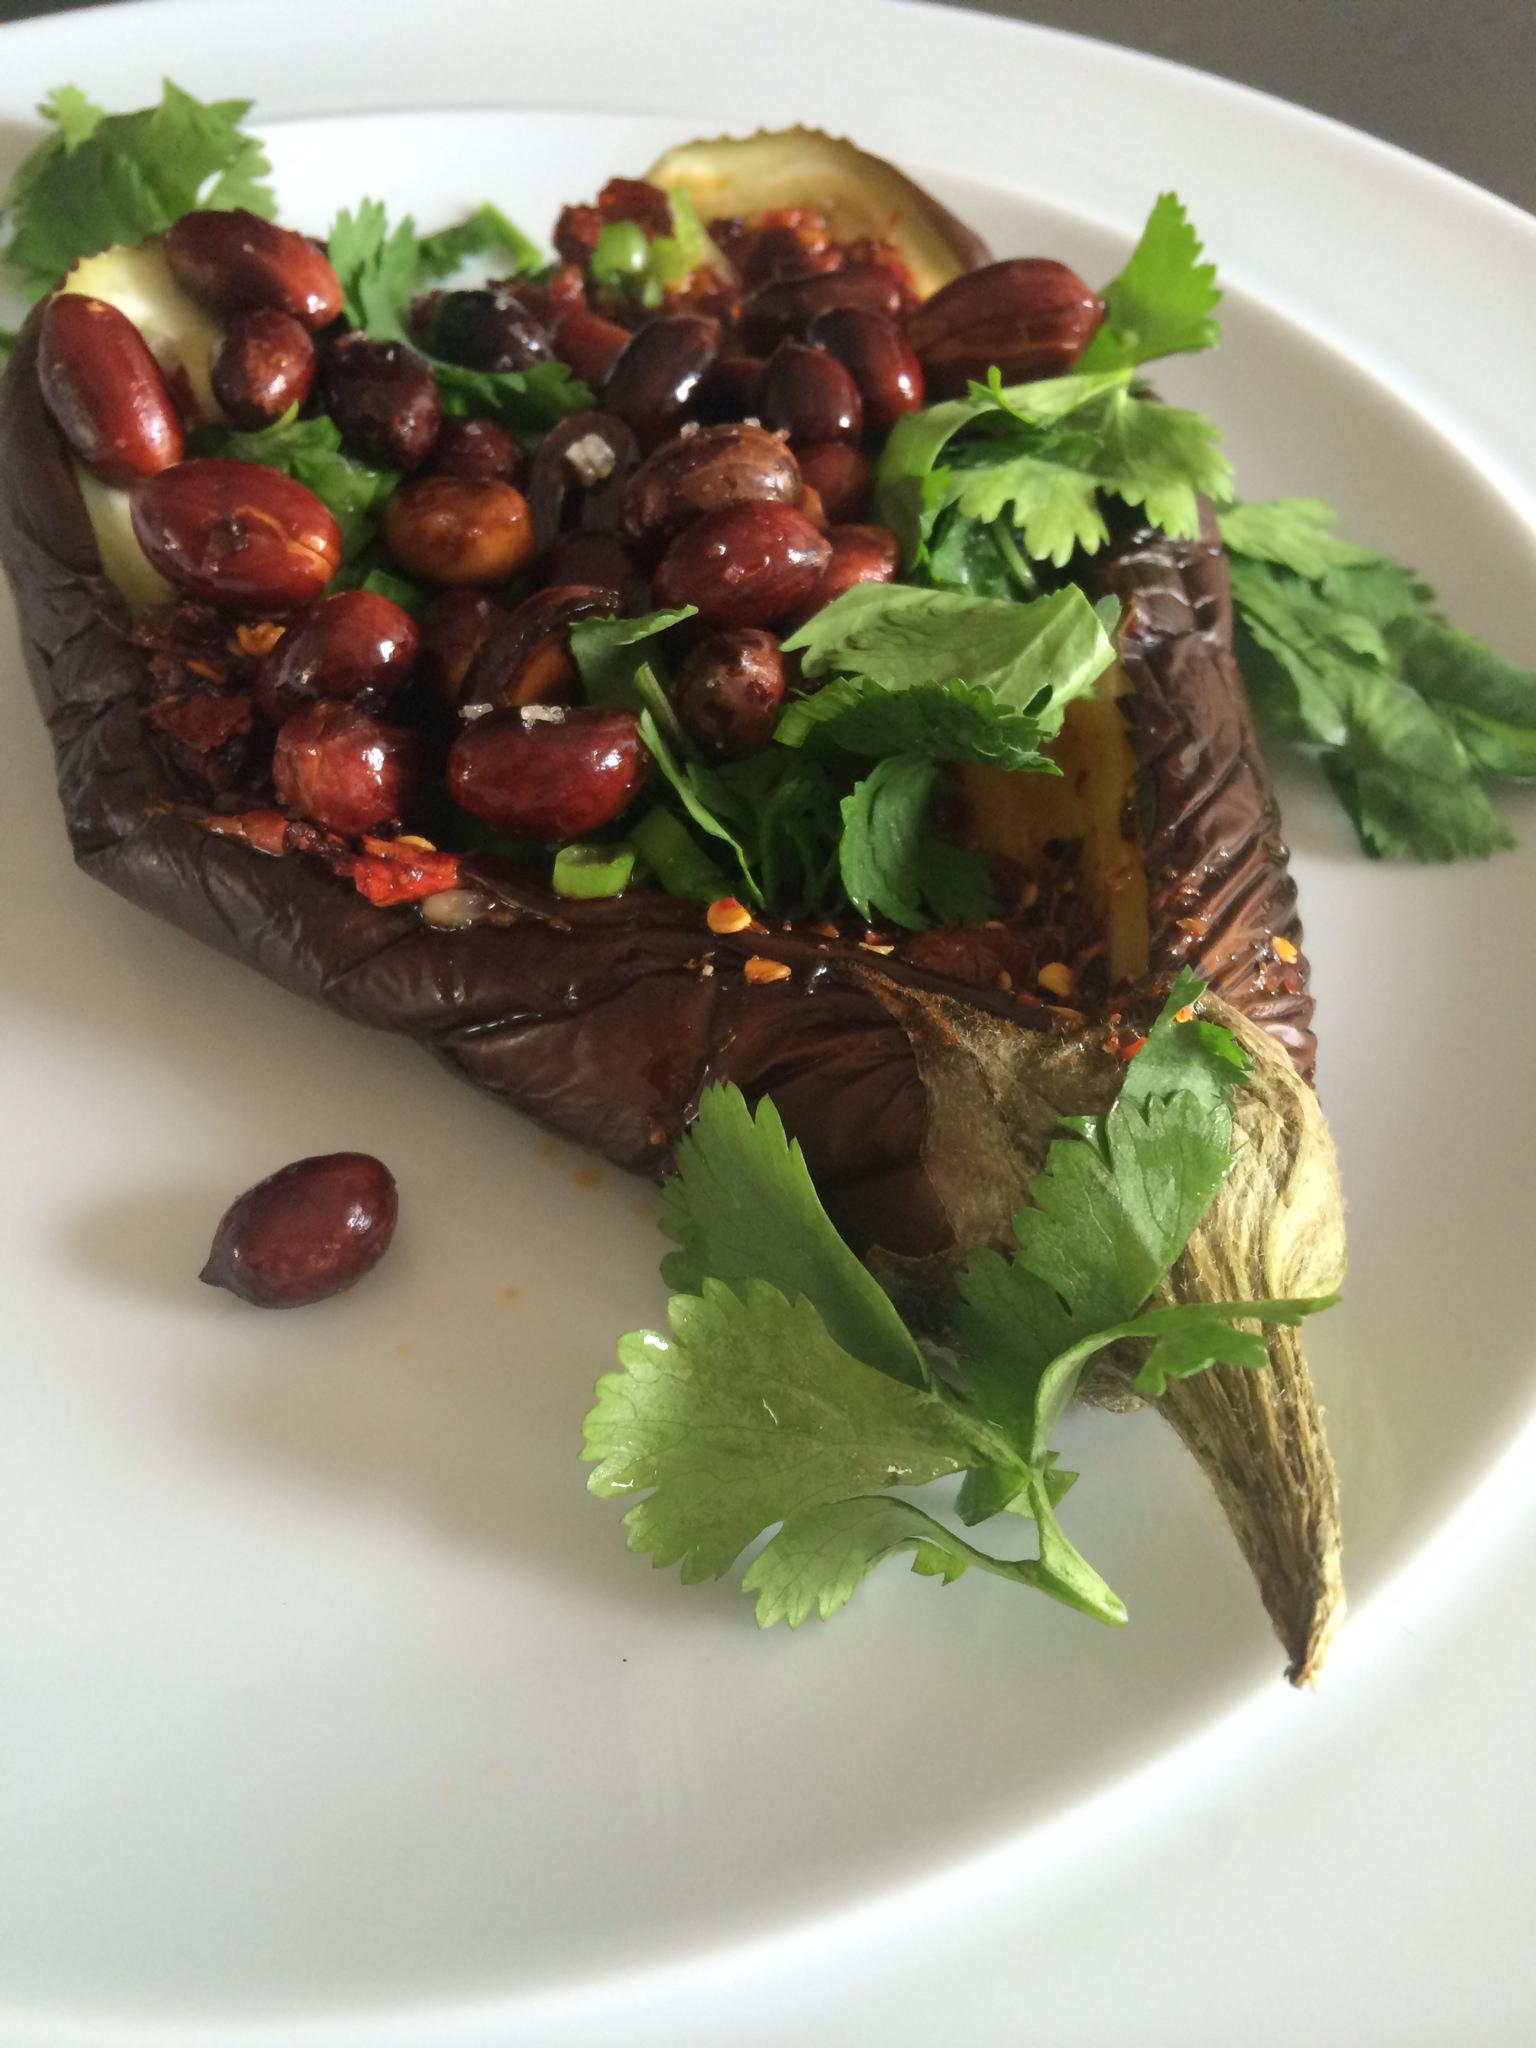 Dali Grilled Eggplant with Chili bean sauce